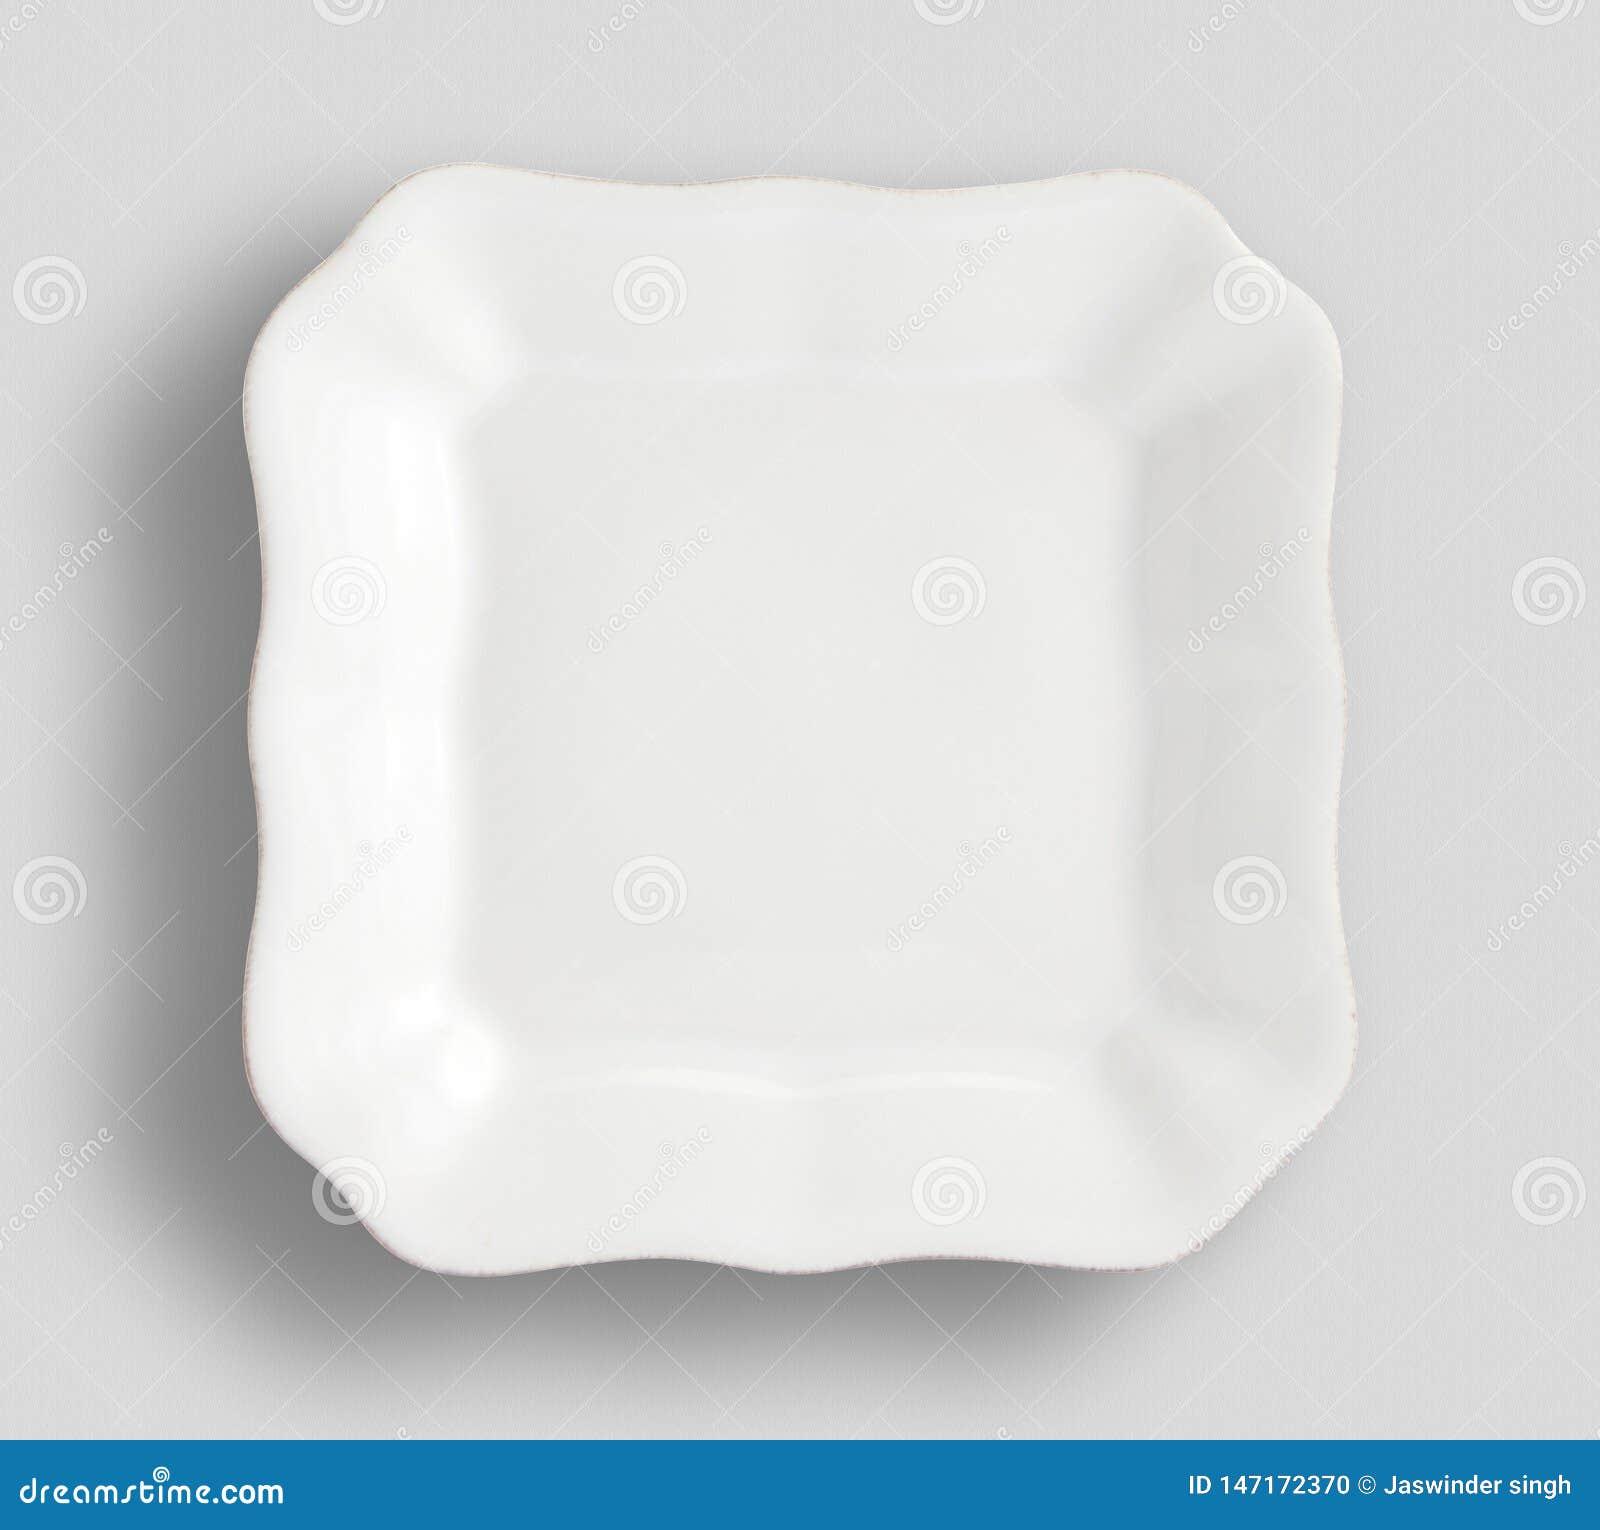 Tom vit rund platta p? vit bakgrund f?r din design, oval vit tom platta som isoleras p? vit bakgrund, tomma vita plommoner